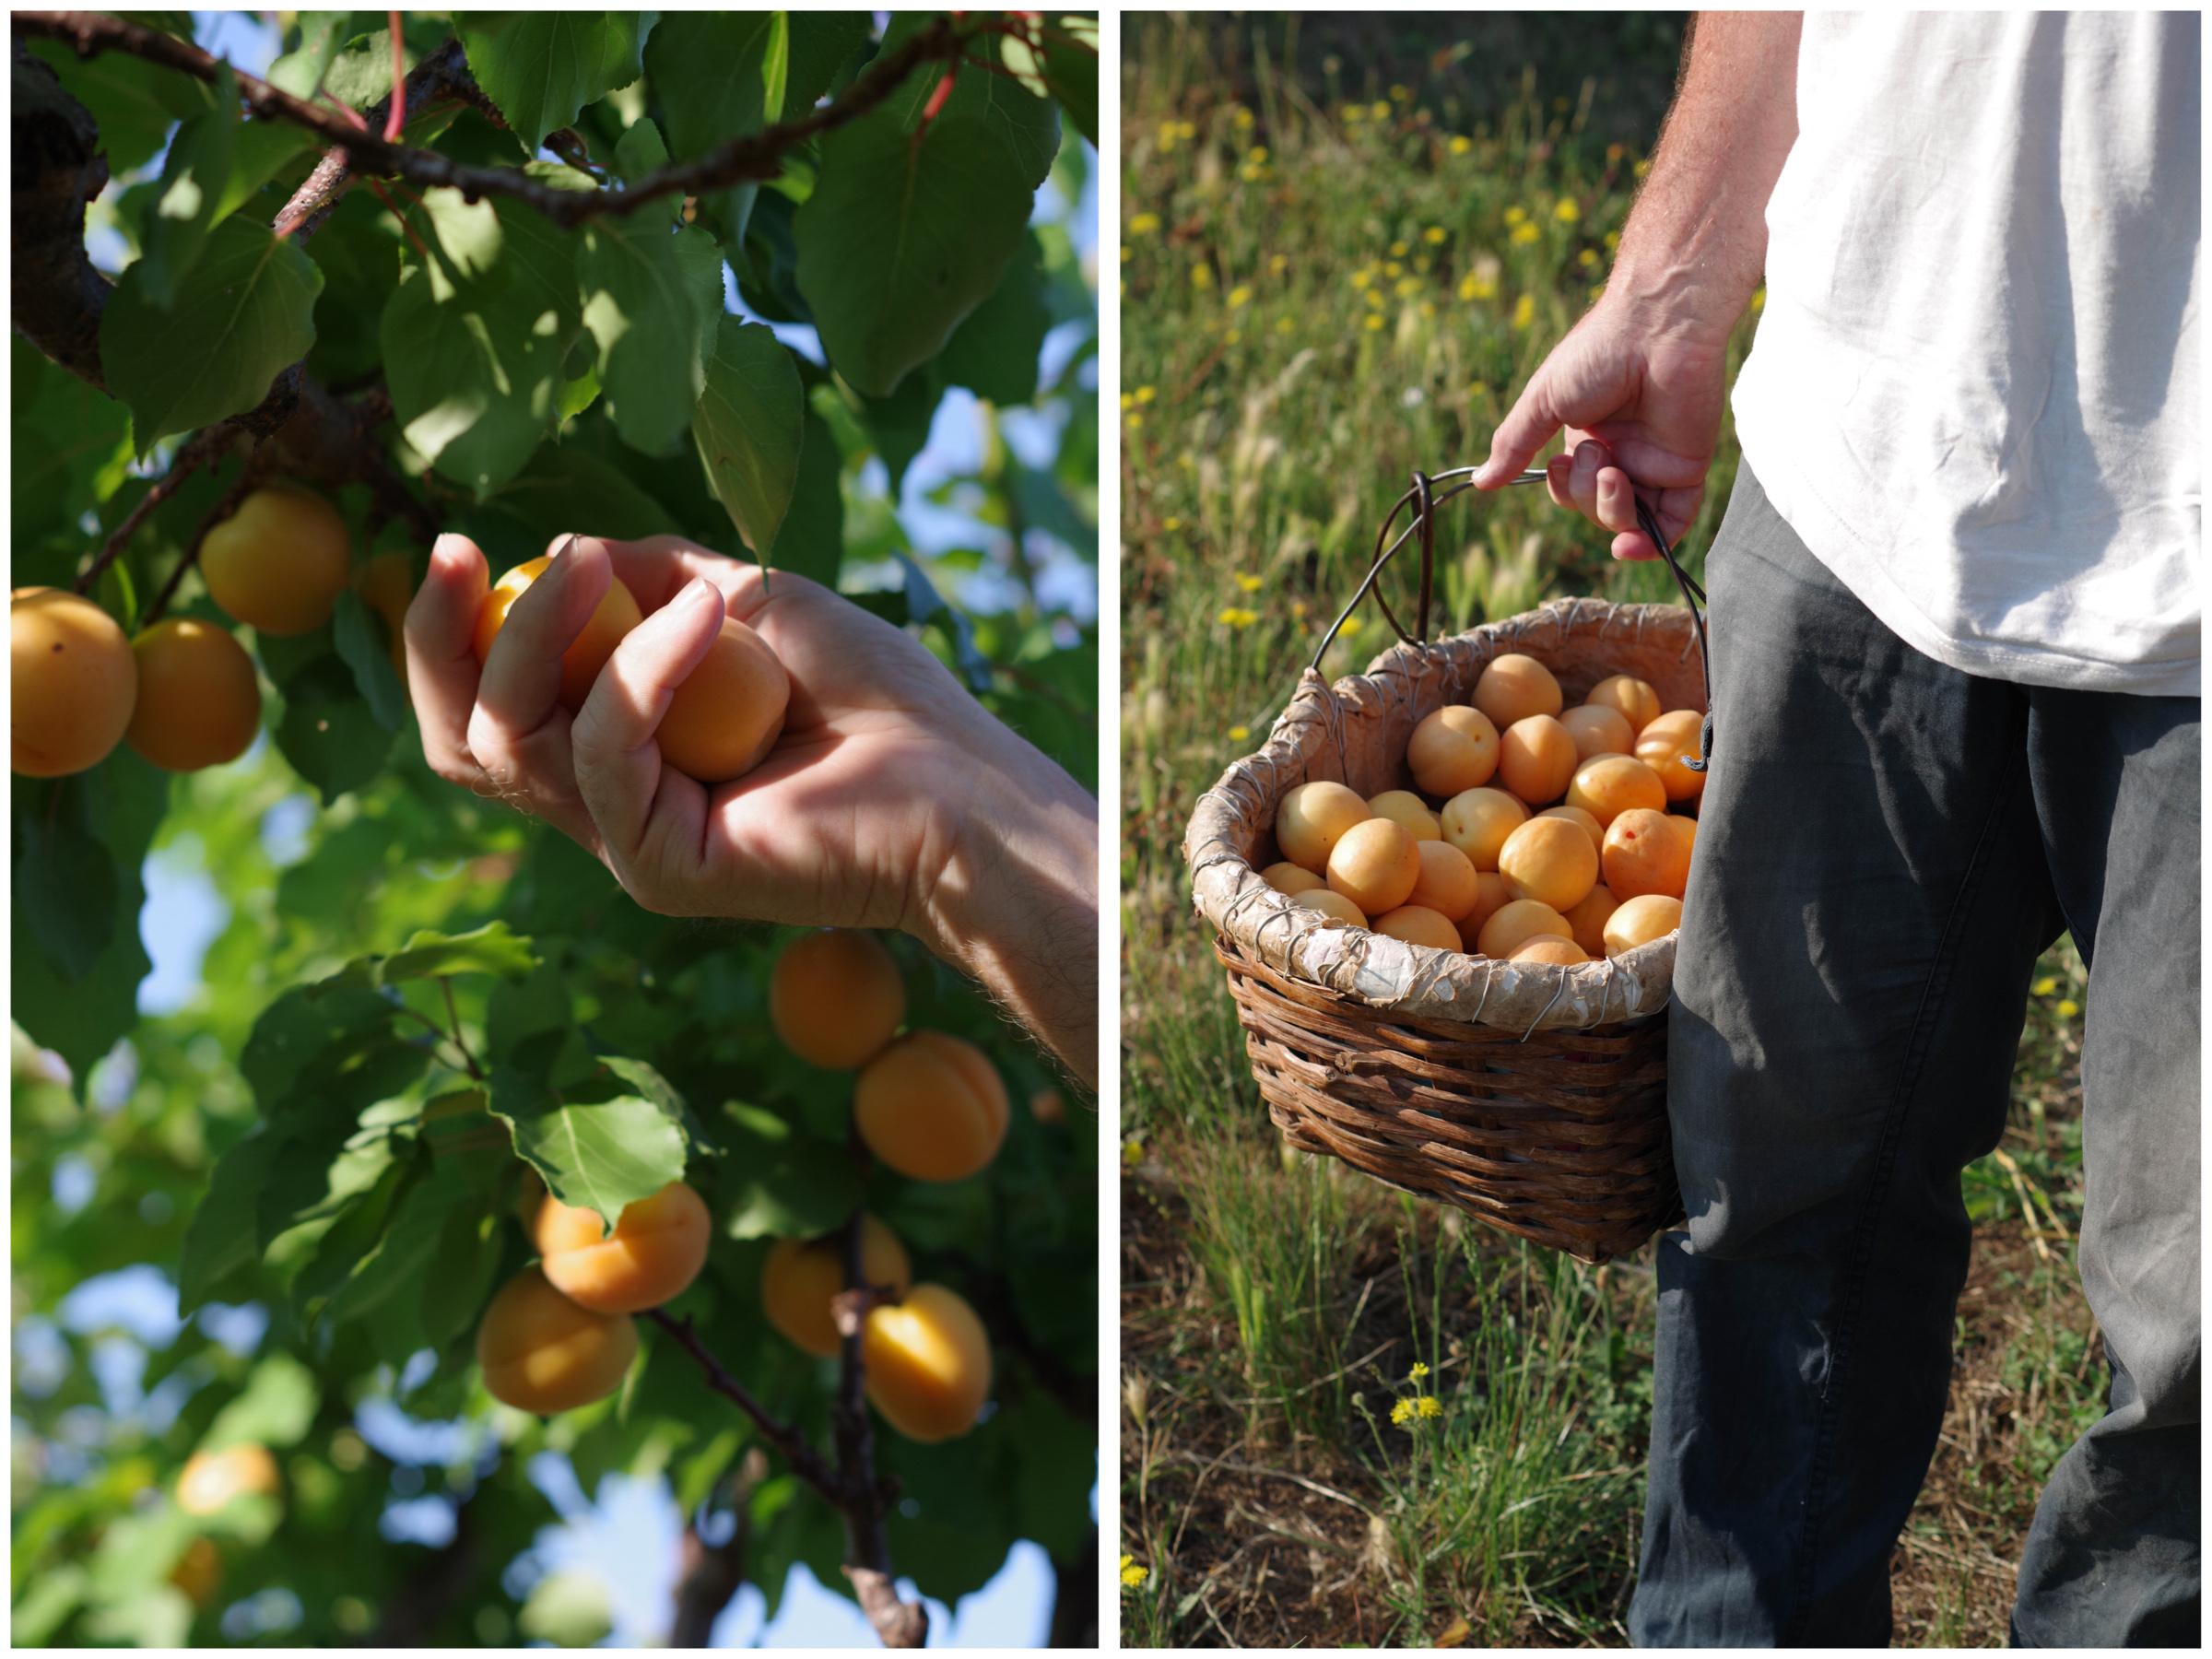 Valleggia apricots